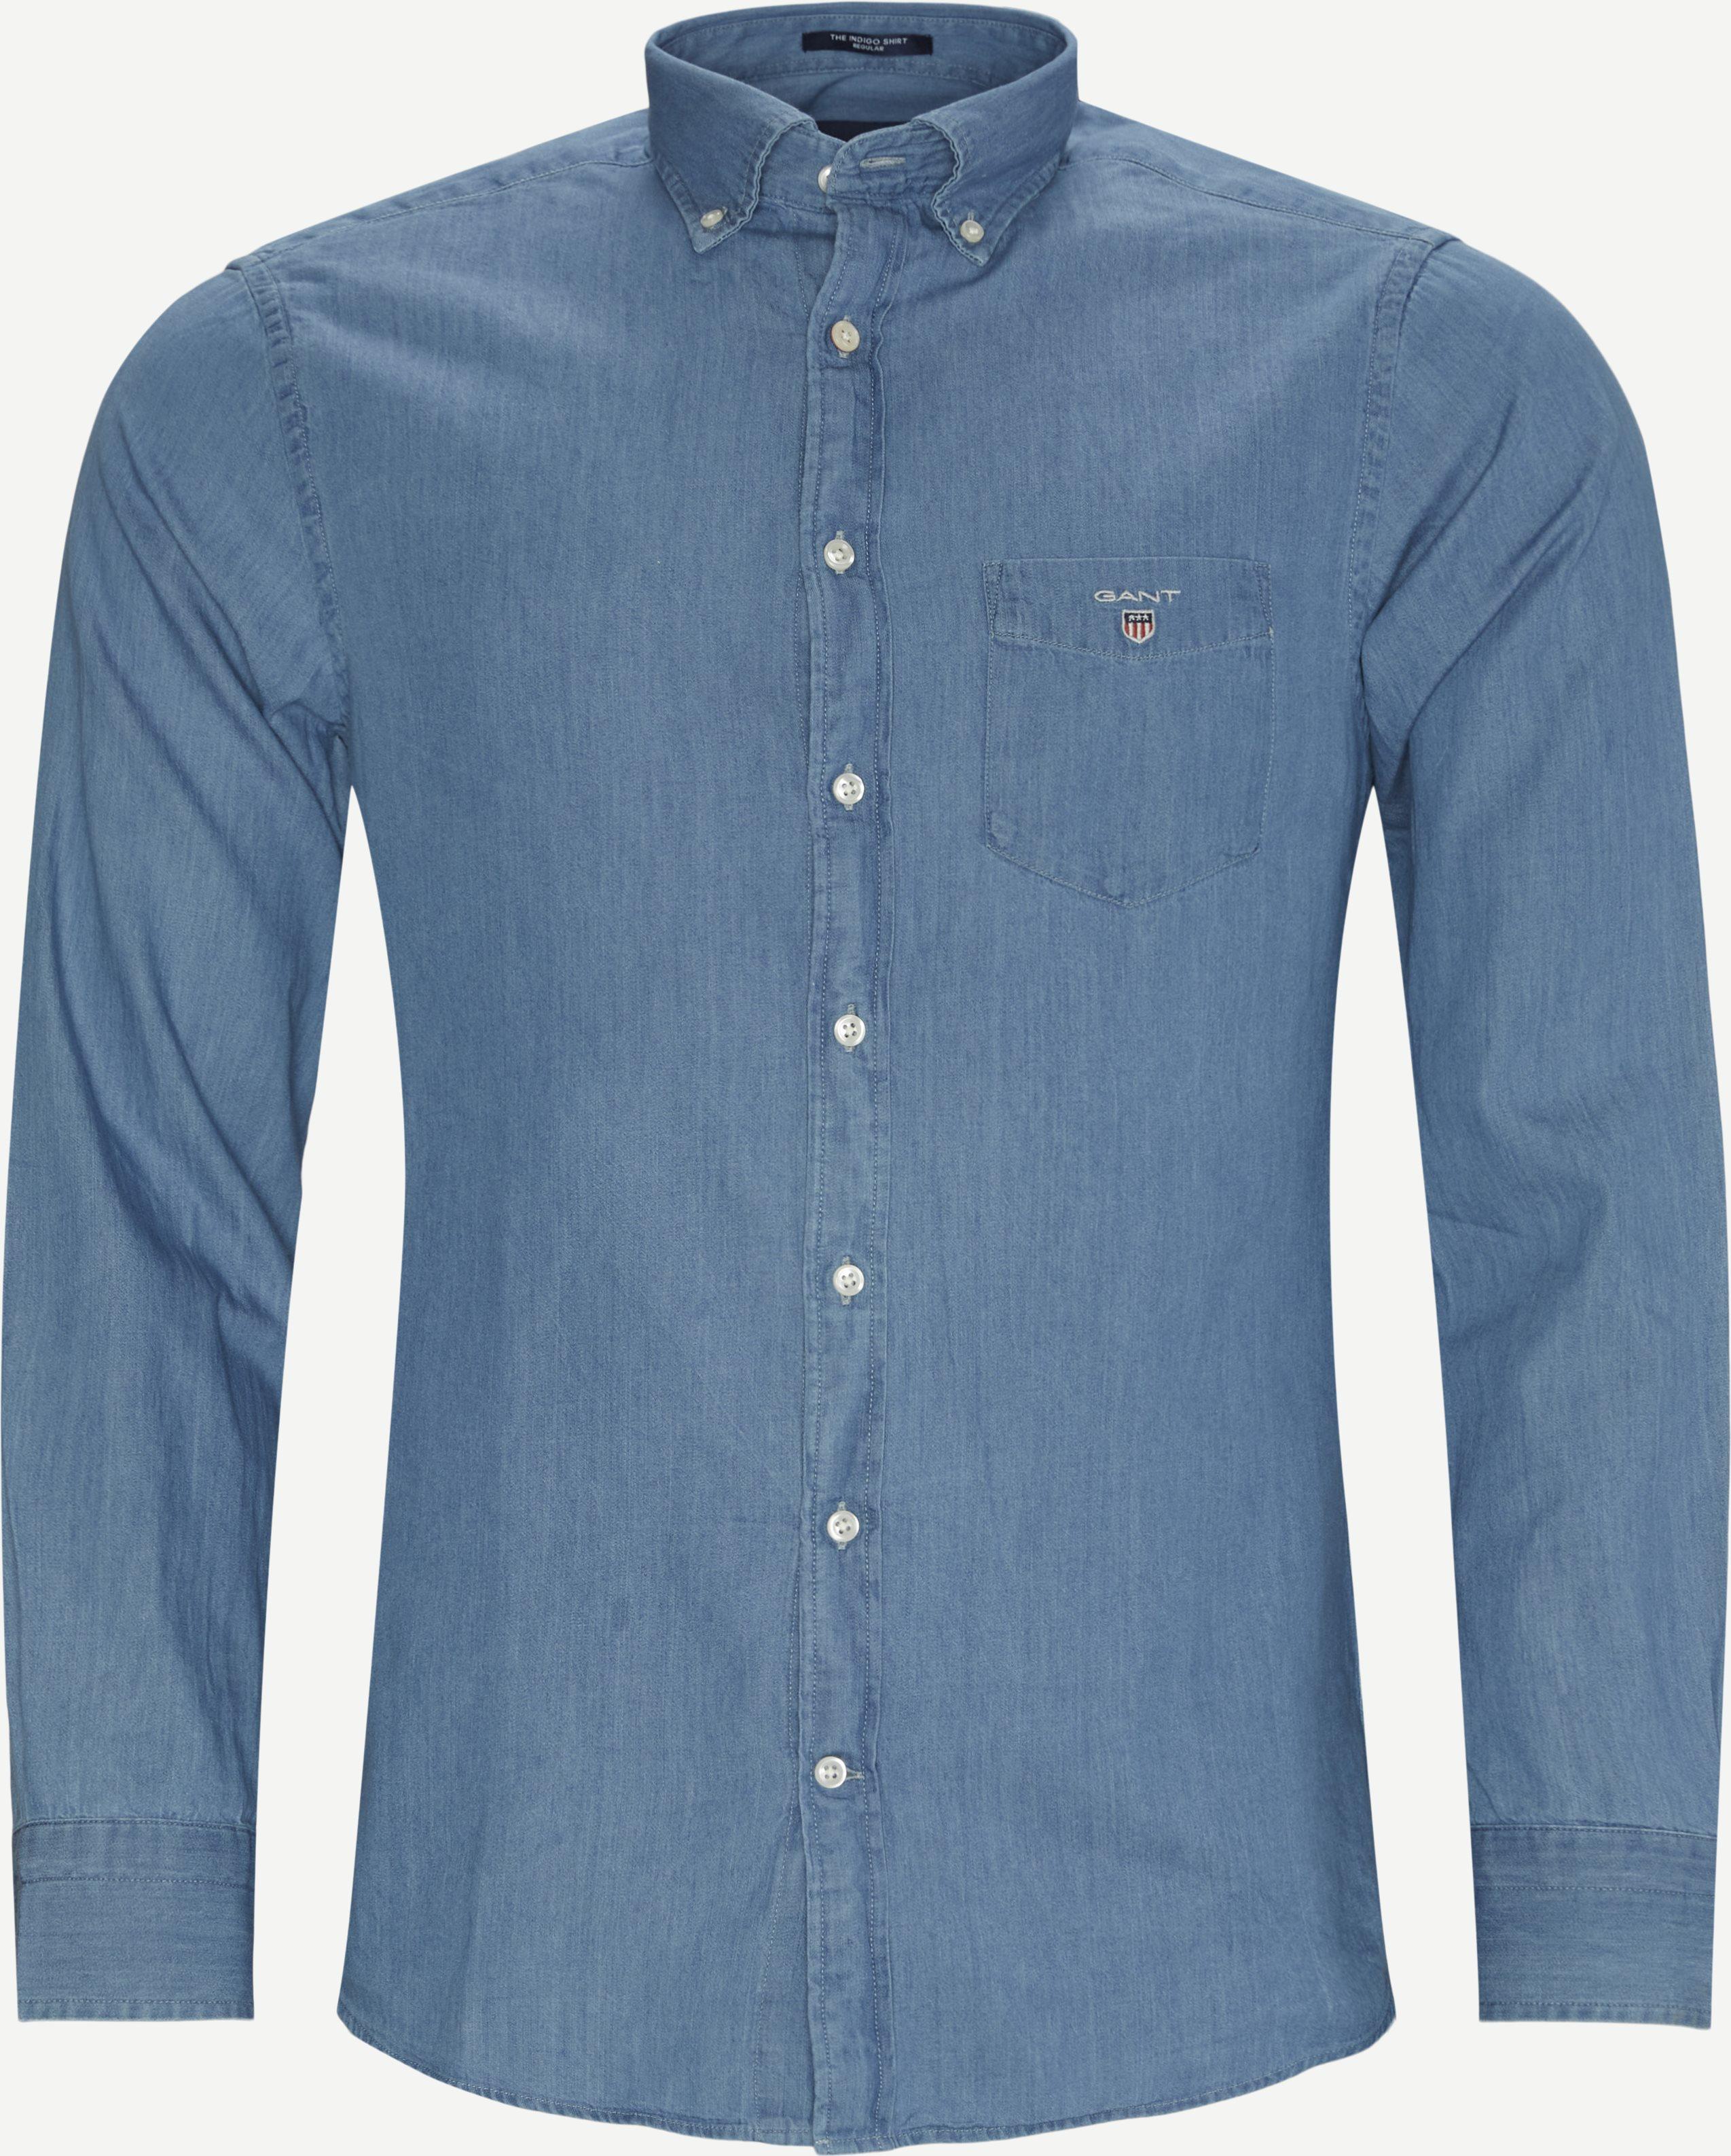 Reg Indigo Skjorte - Shirts - Regular - Denim